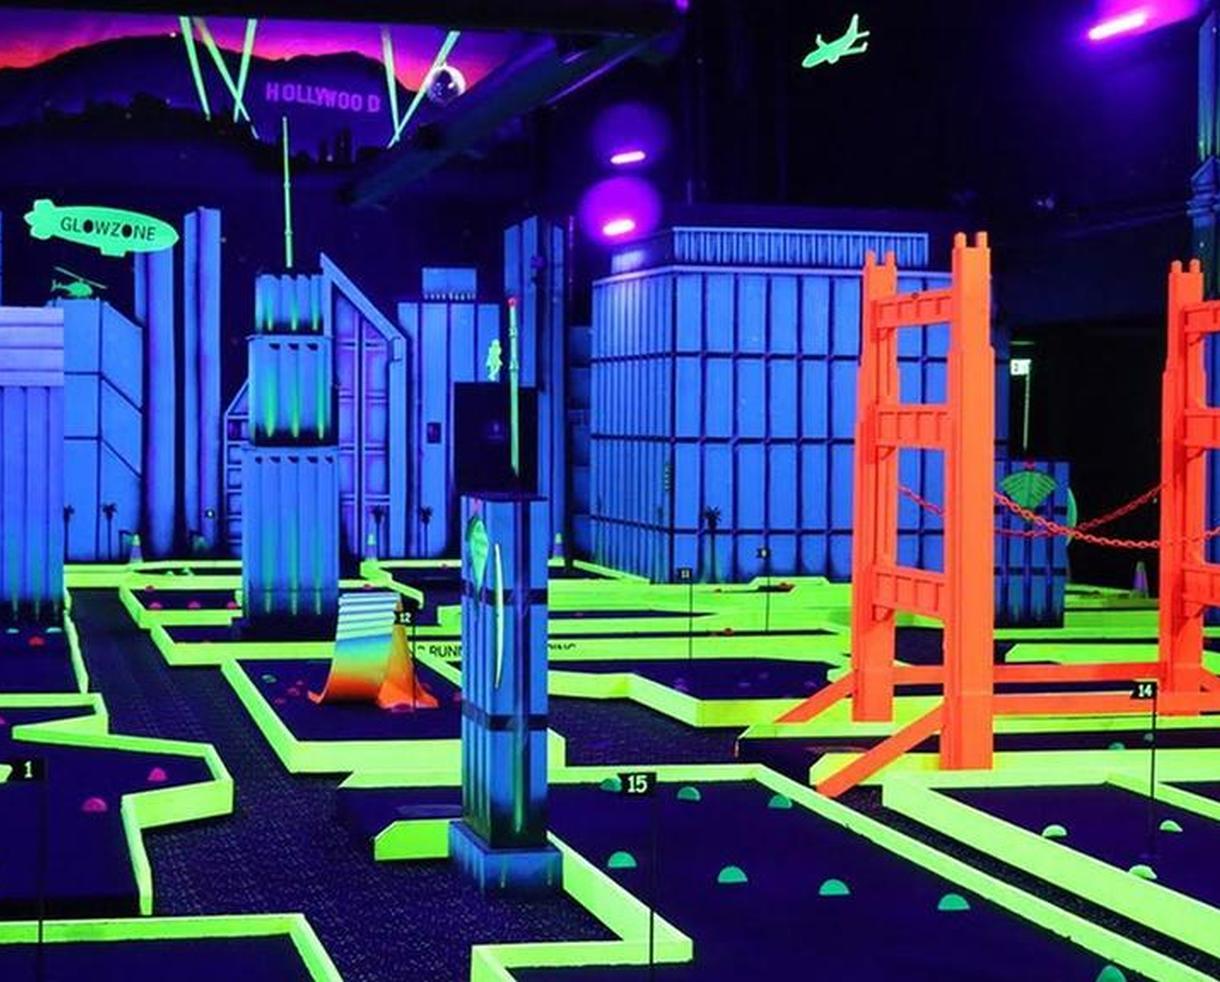 Glowzone Interactive Activites - Bazooka Ball, Ninja Warrior Course, Kids Jungle Gym & More!